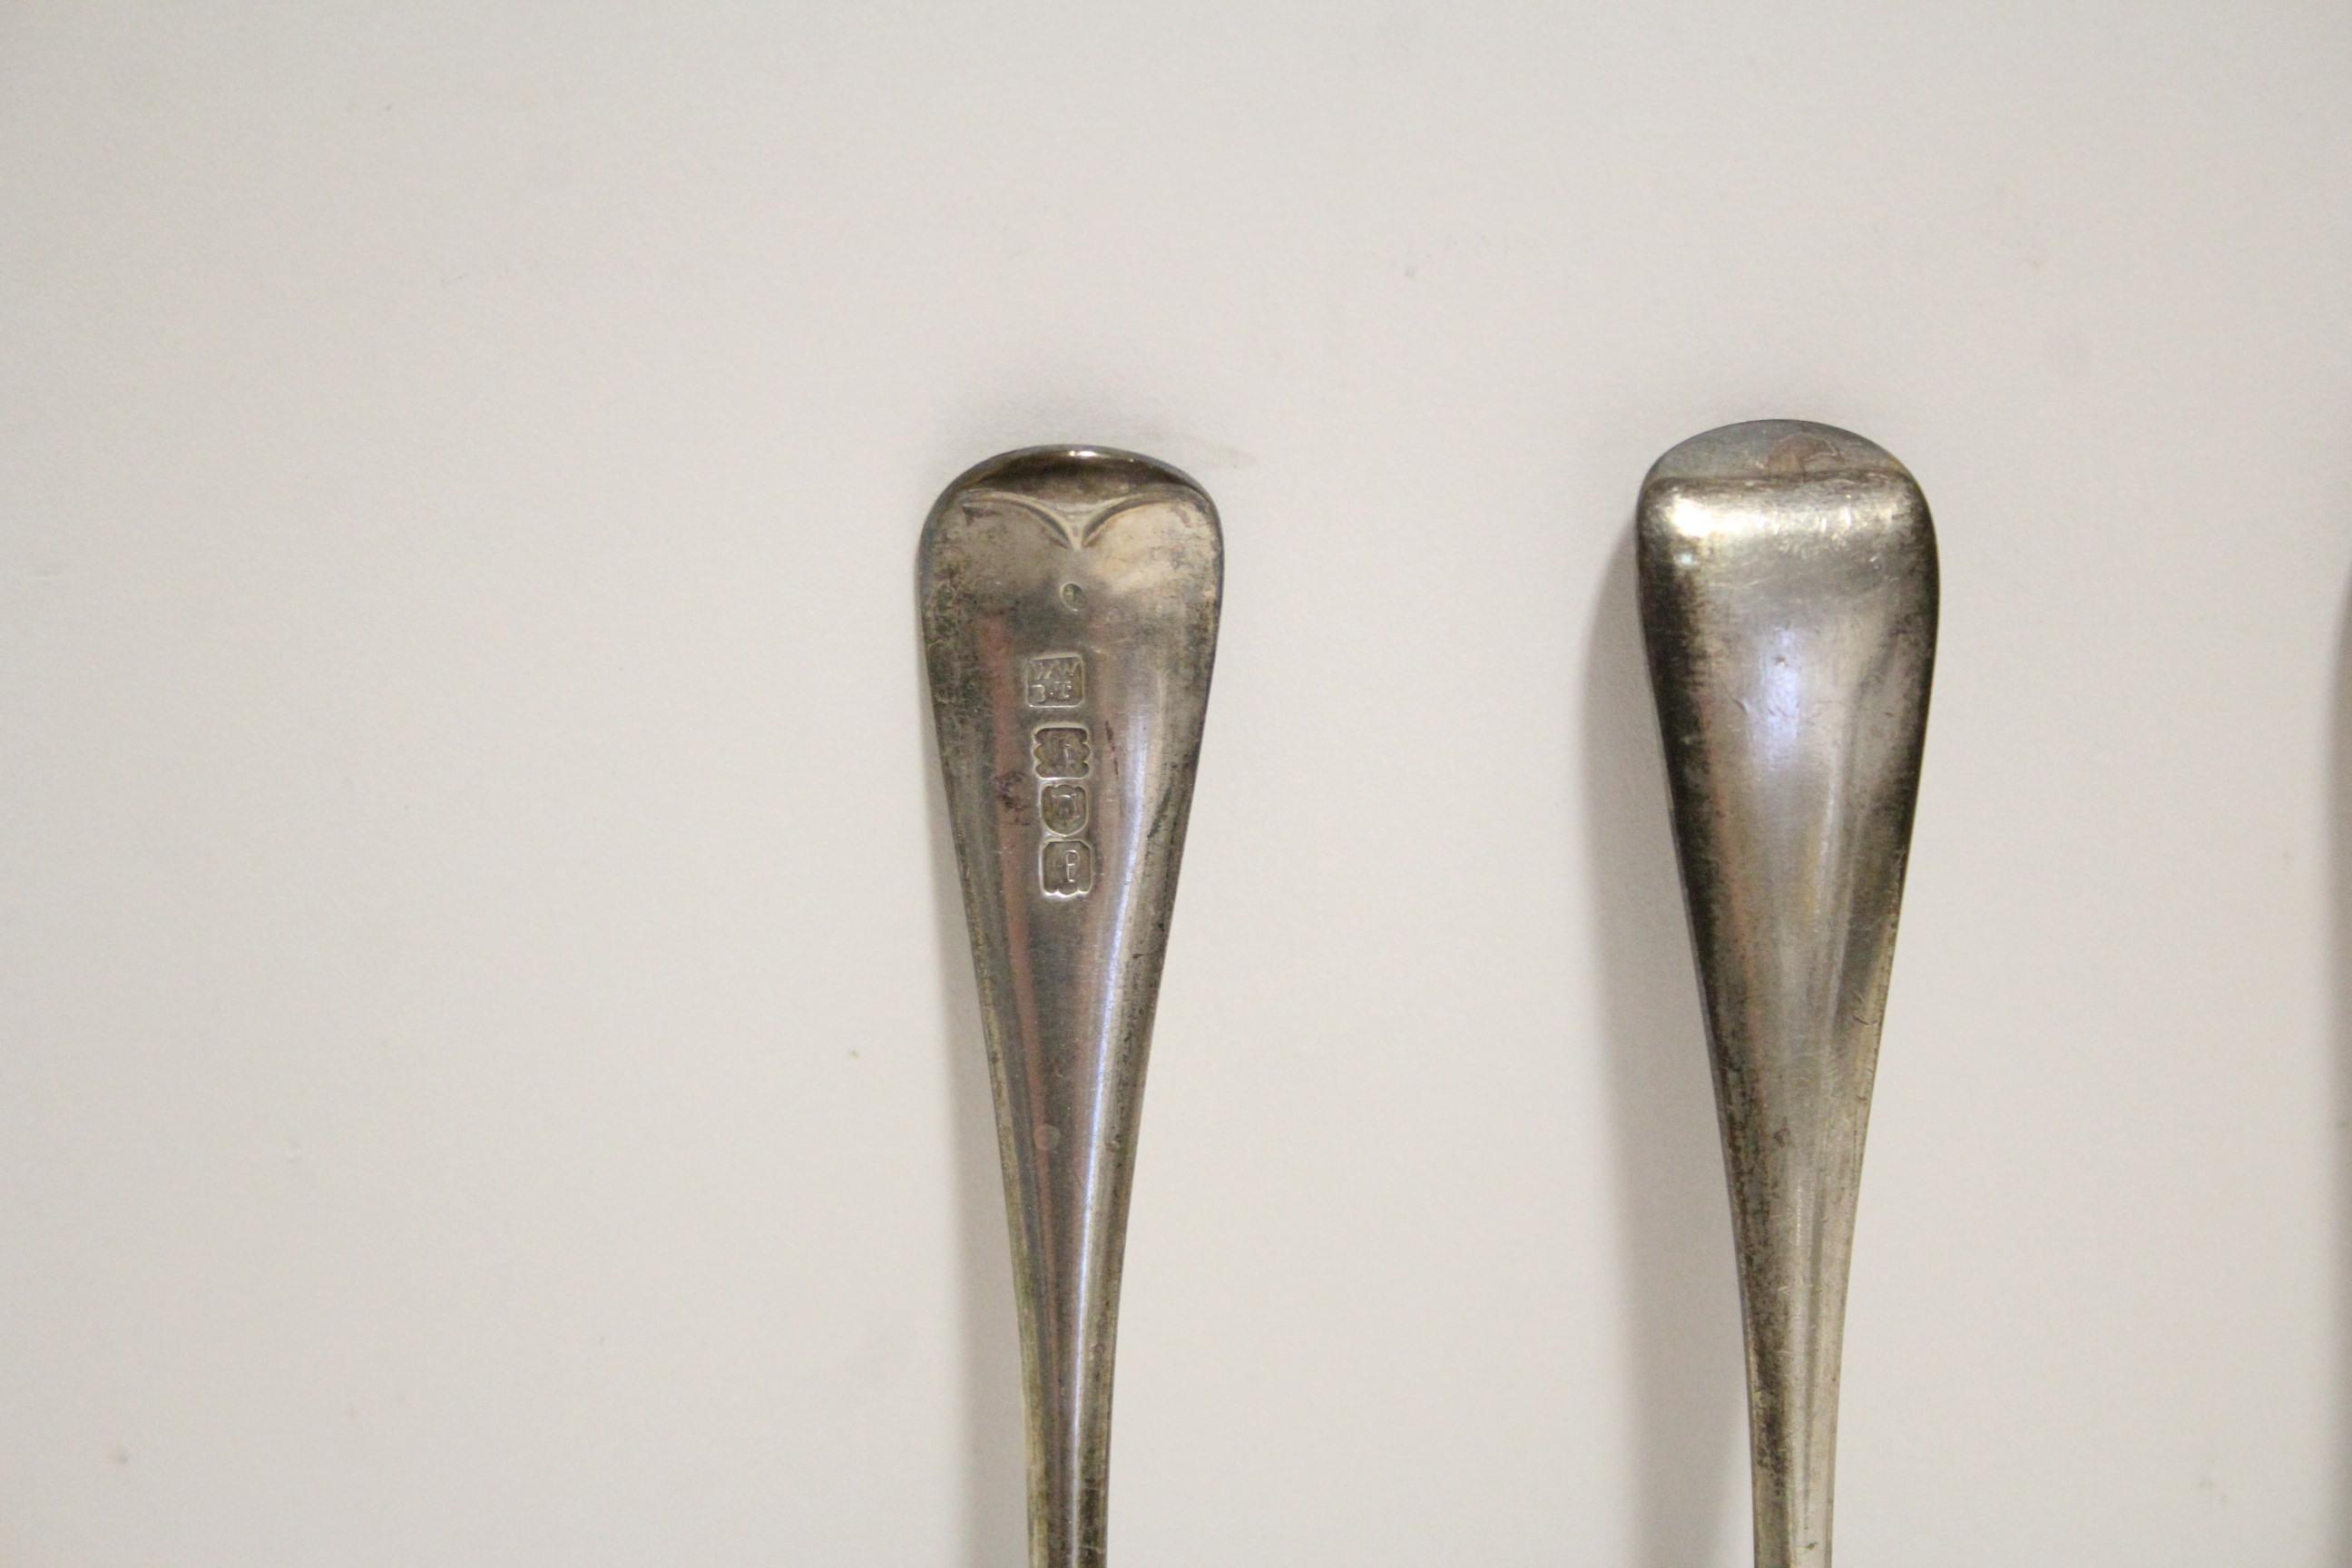 Lot 24 - Six Edwardian Old English dessert spoons; London 1901, by Johnson, Walker, & Tolhurst Ltd. (9 oz).